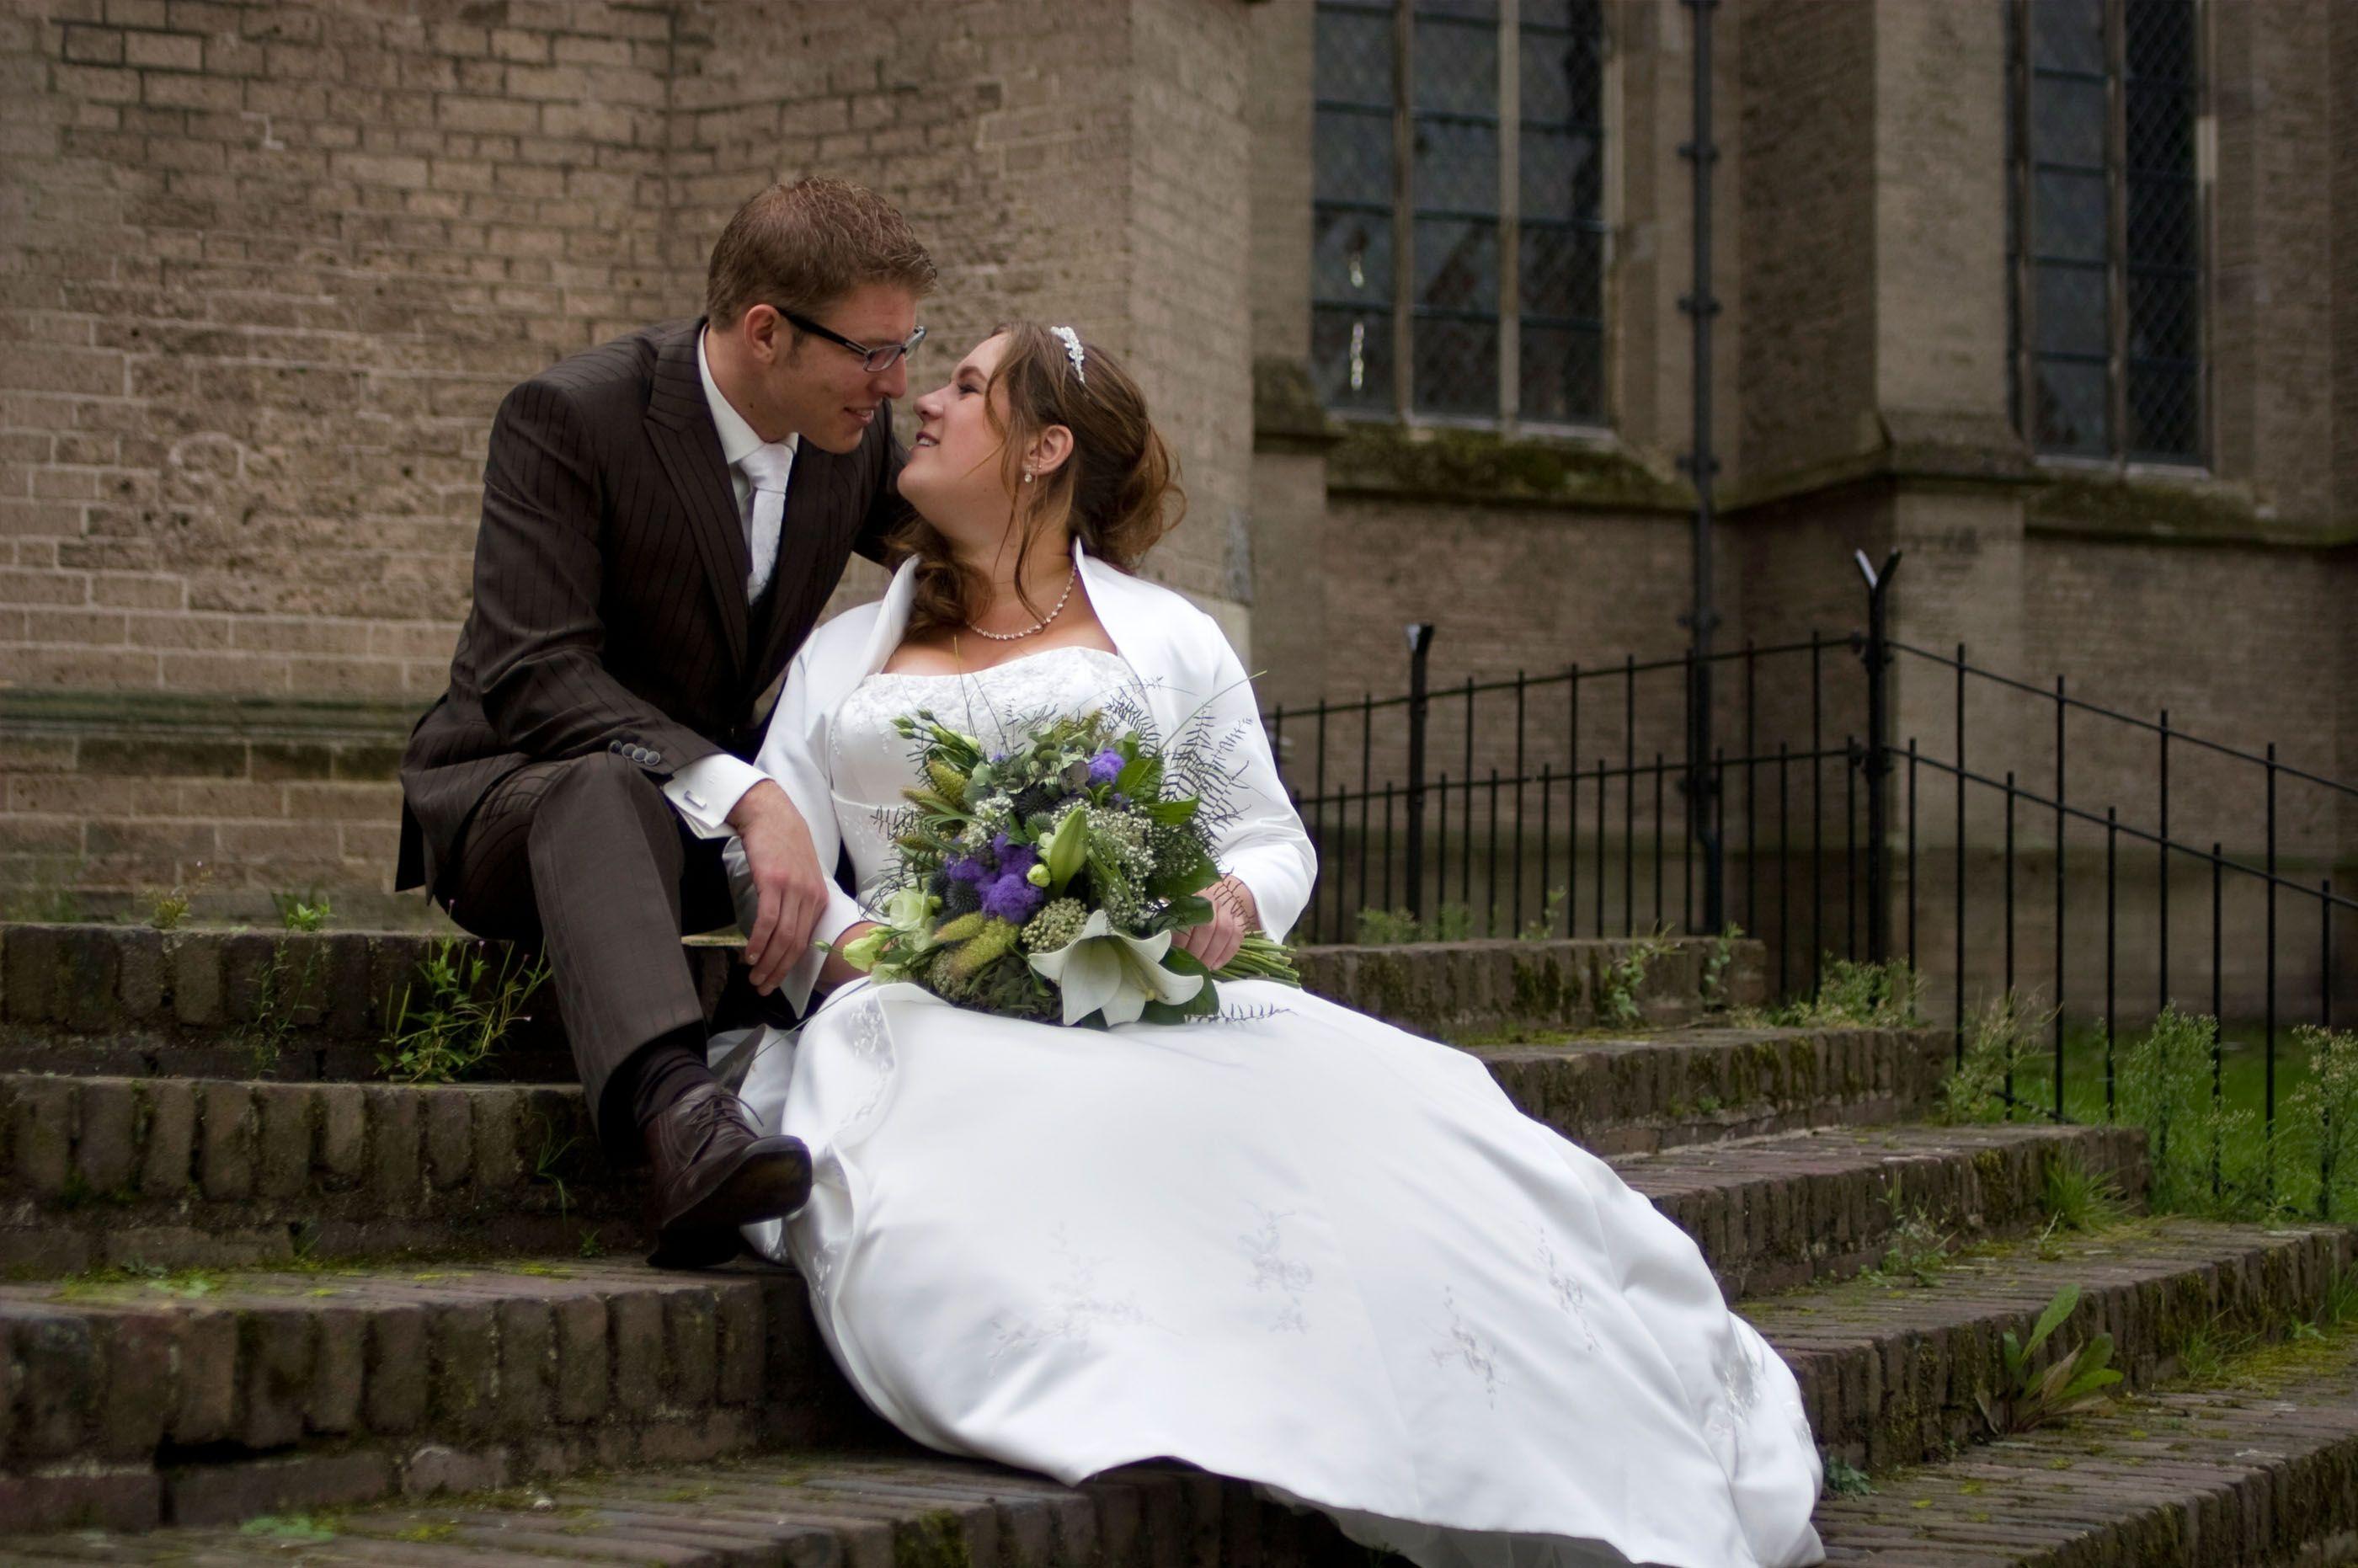 Peter & Hanneke Hanneke, Lovely  Weddingphotography, bruidsfotografie www.deweerdfotografie.nl (copyright Pim de Weerd)